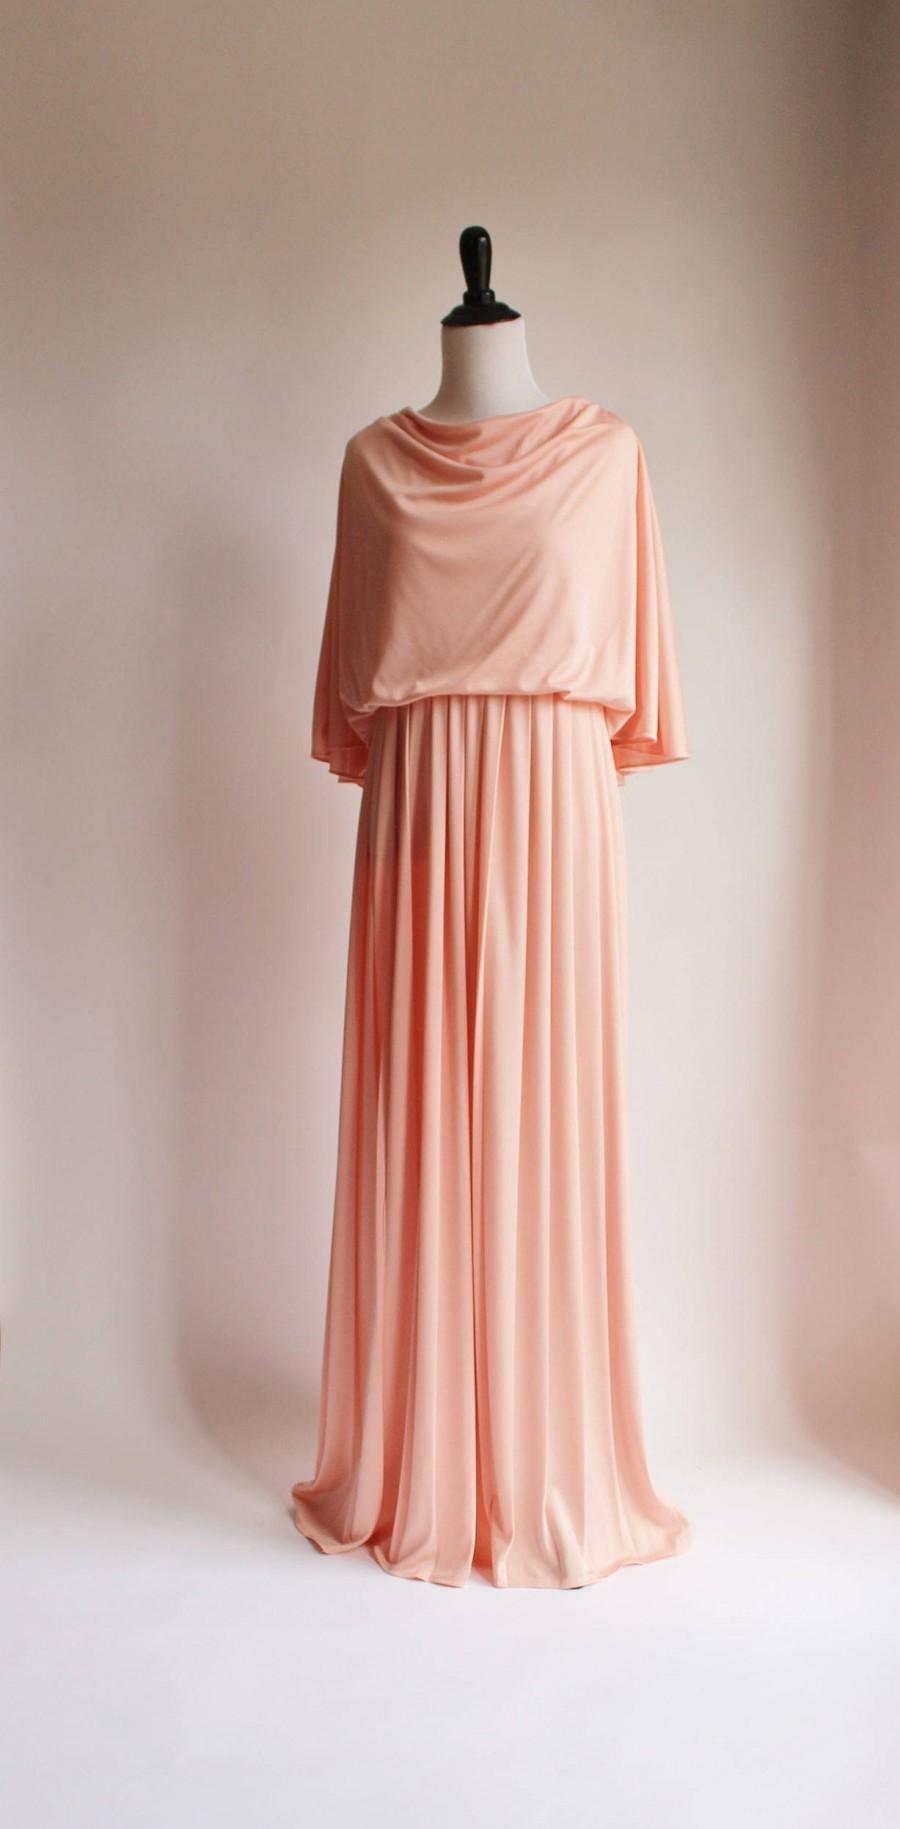 زفاف - Vintage Womens Dress, Cape Dress, Grecian Gown, 70s Pink Maxi Dress